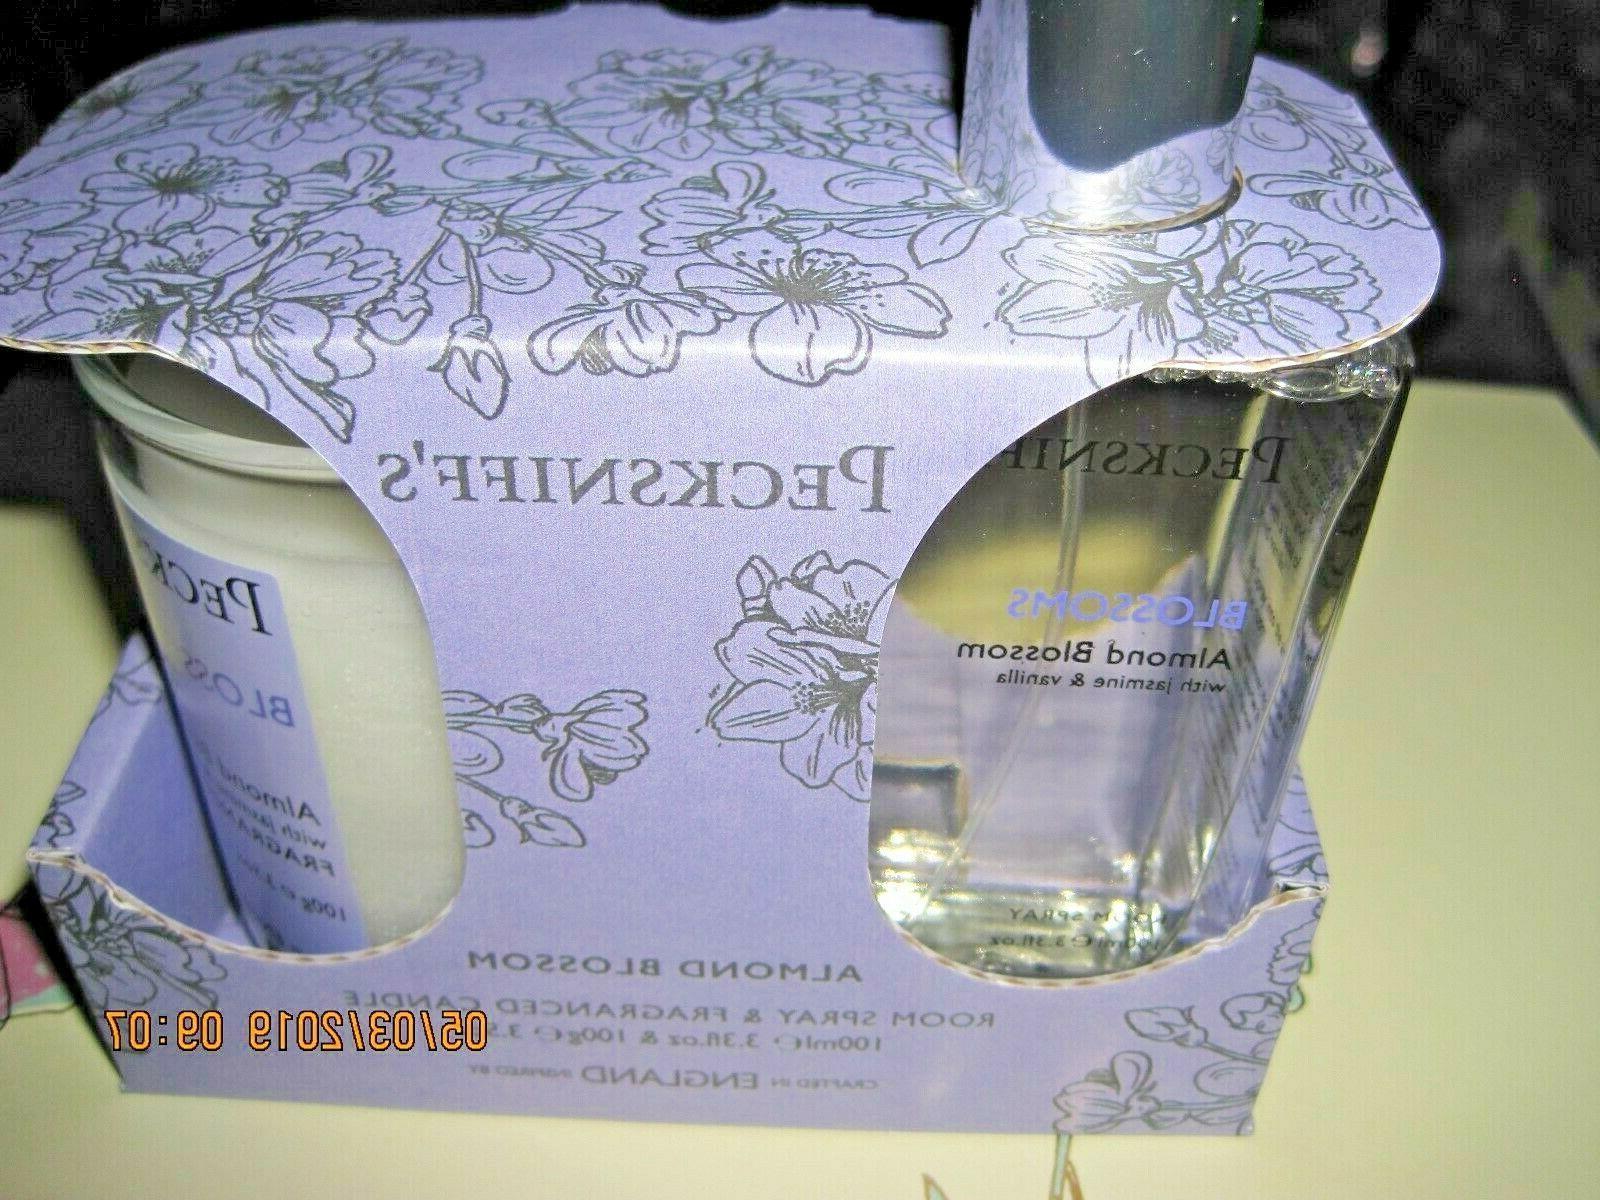 Pecksniff's Almond Blossom Jar Candle 3.5oz Spray 3.3 oz Set New box